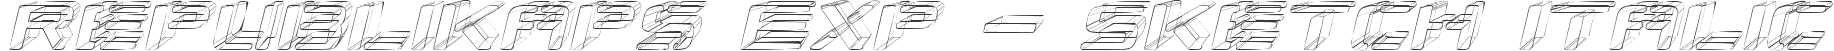 Republikaps Exp - Sketch Italic